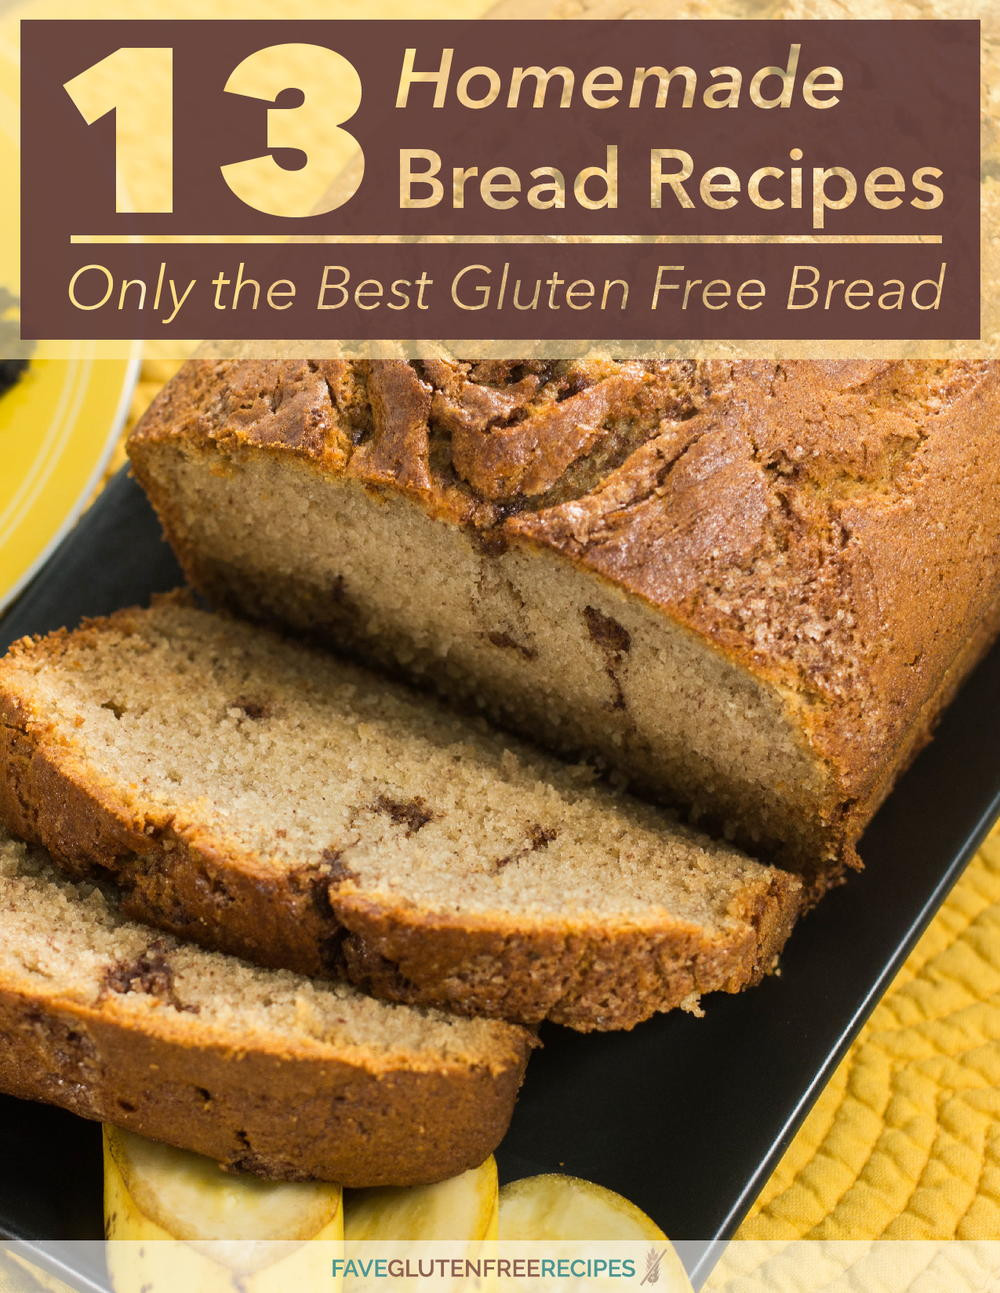 Diy Gluten Free Bread  13 Homemade Bread Recipes ly the Best Gluten Free Bread